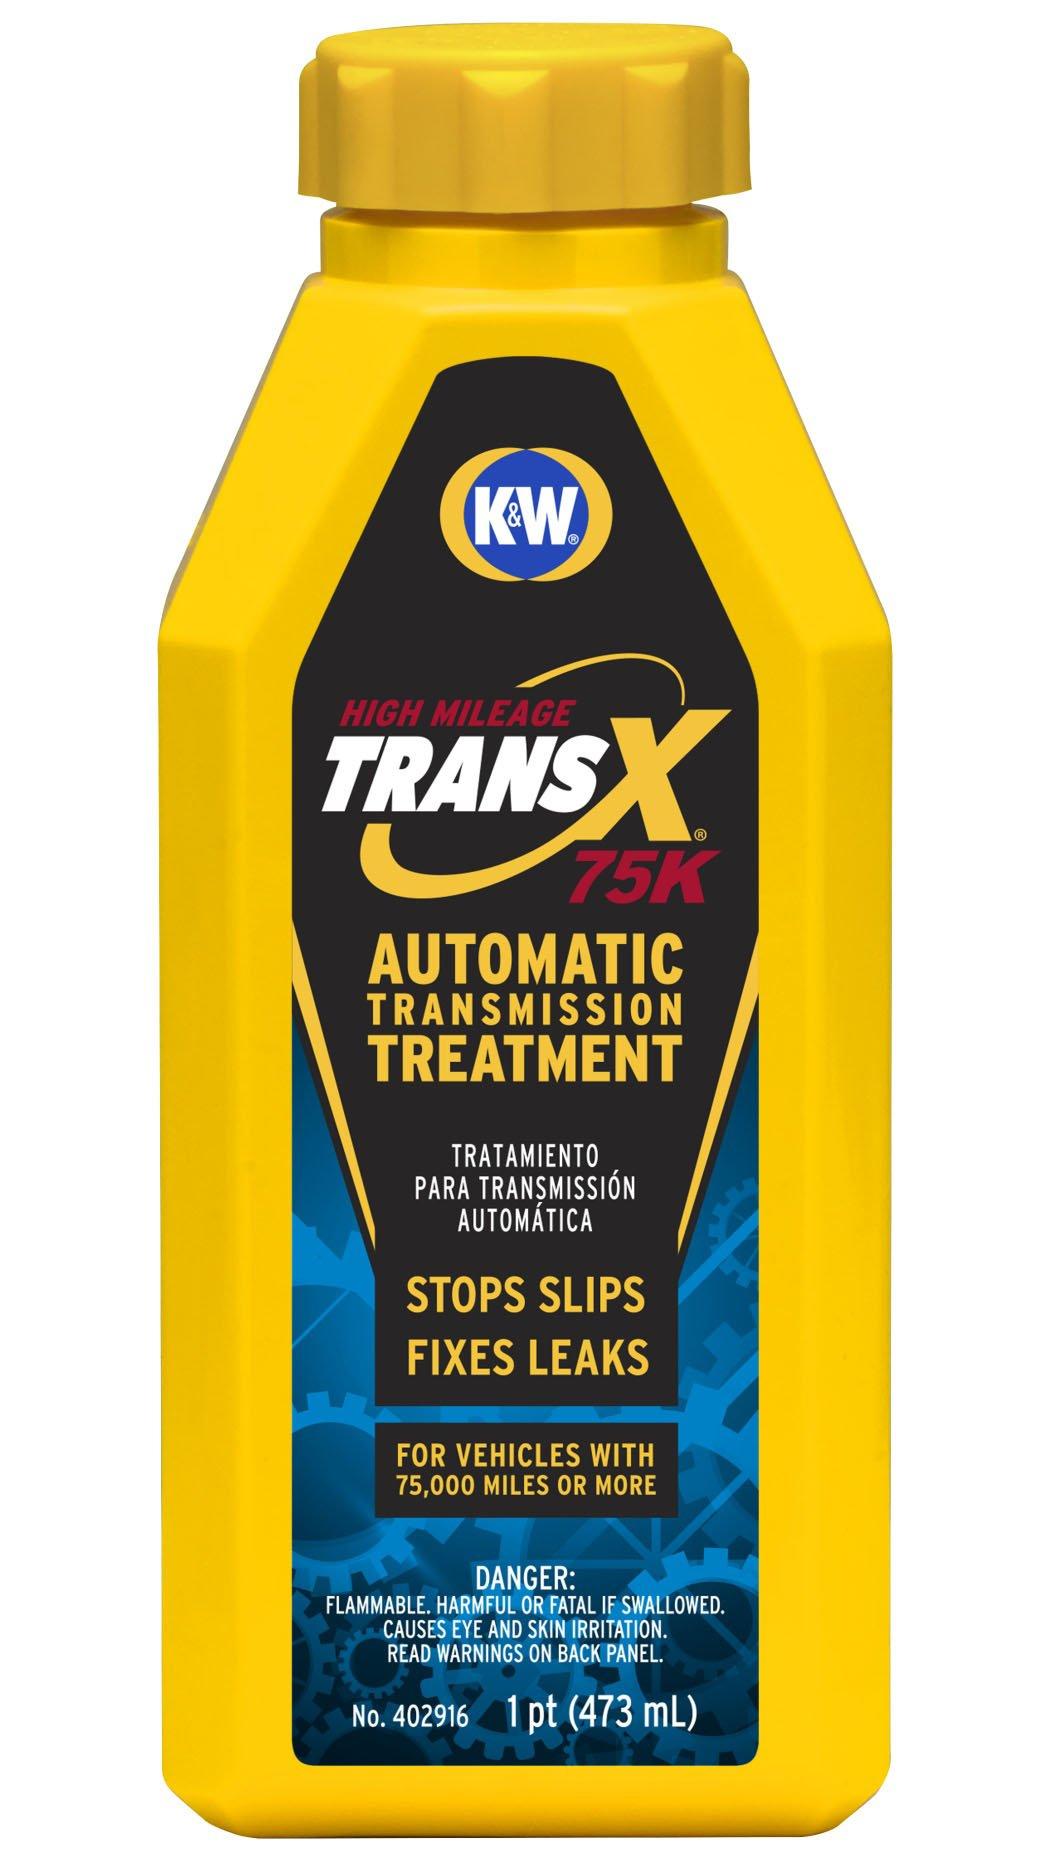 K&W 402916x6 Trans-X High Mileage Automatic Transmission Treatment - 16 Fl Oz by K&W